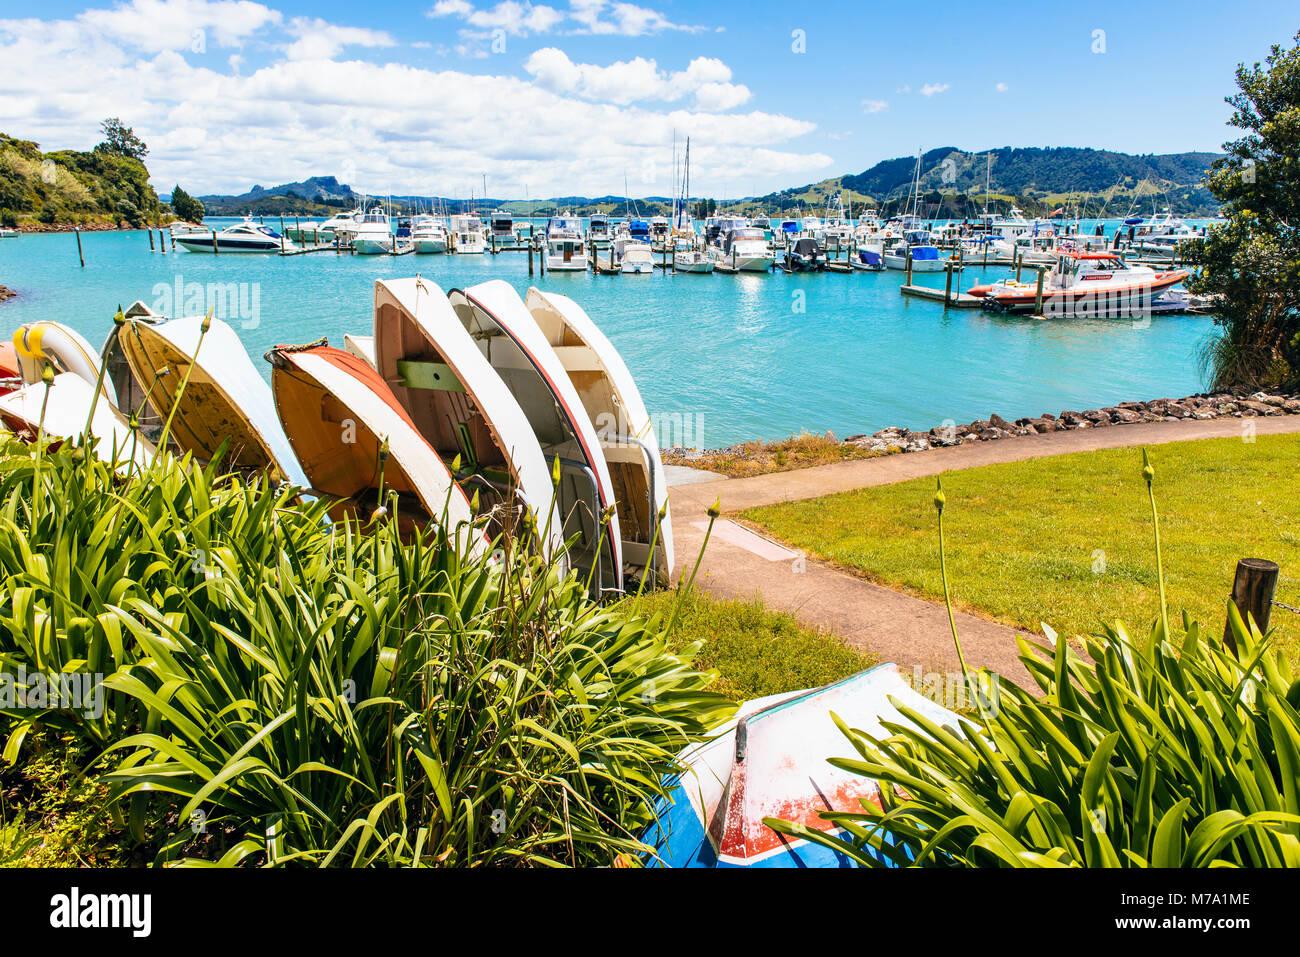 Marina à Whangaroa, île du Nord, Nouvelle-Zélande Photo Stock